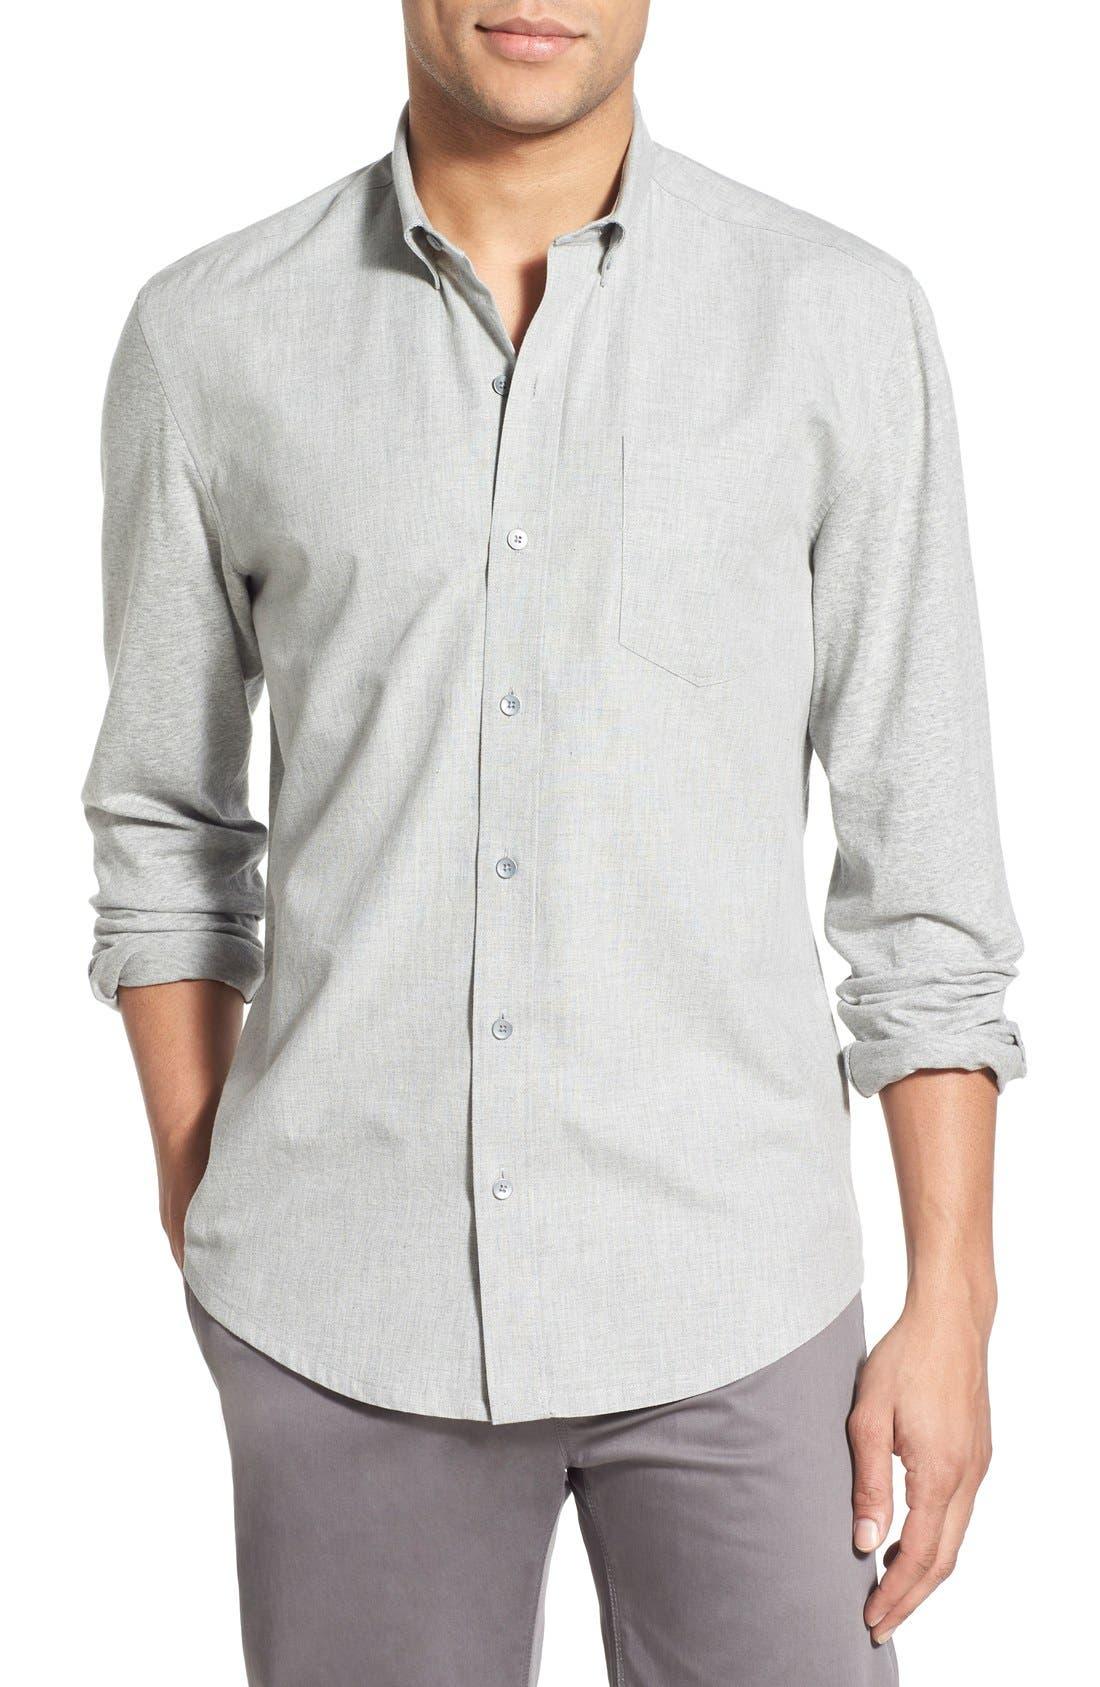 'Reworked' Trim Fit Sport Shirt,                         Main,                         color, Light Grey Heather